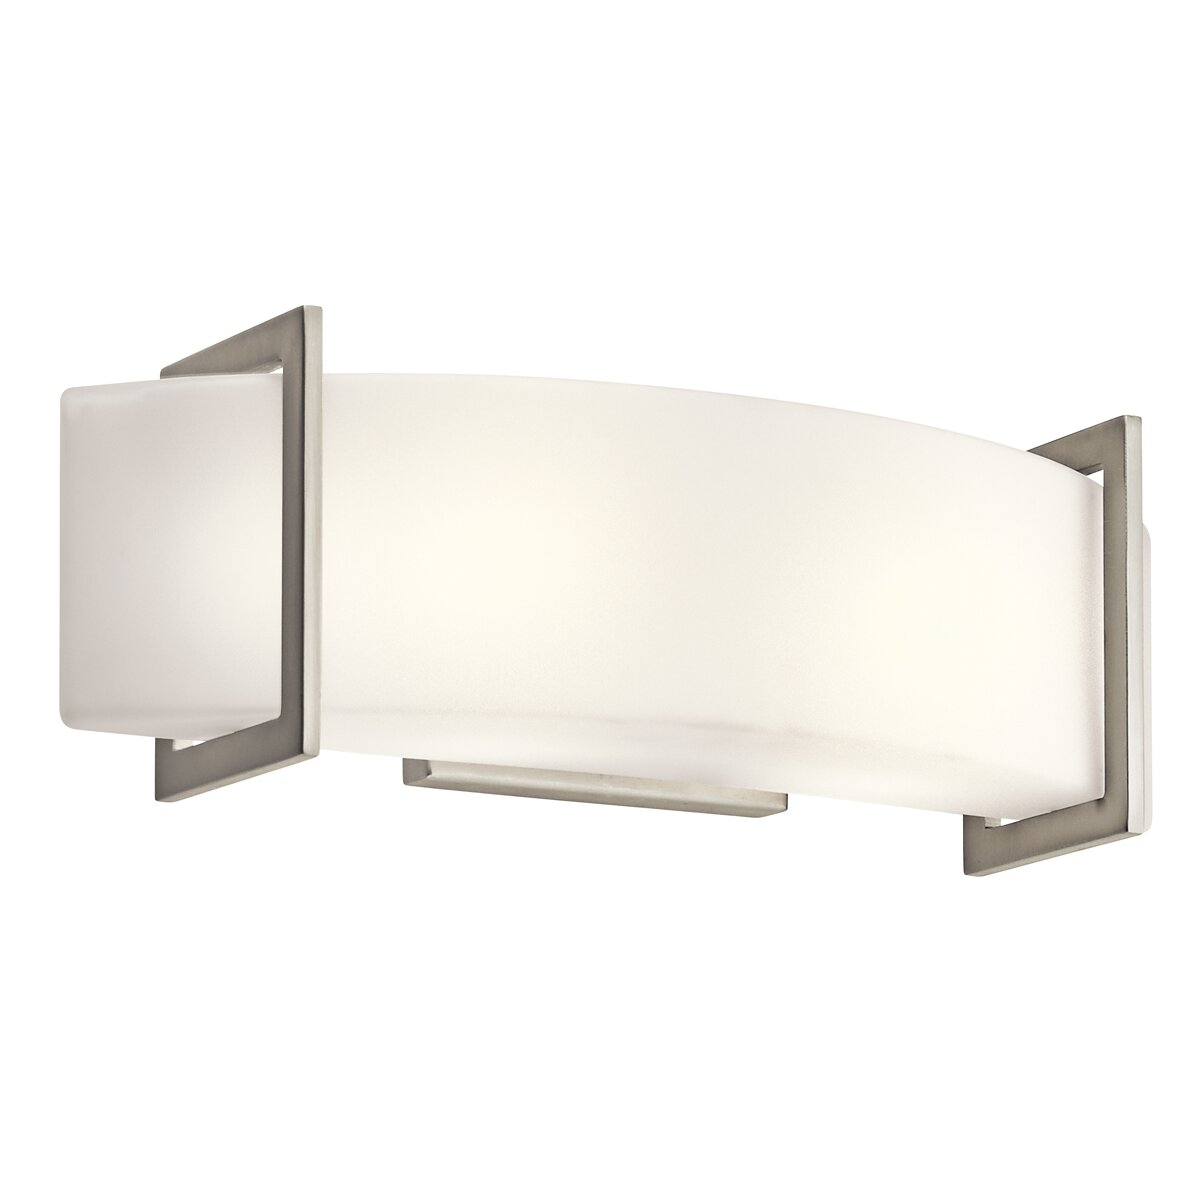 Kichler Crescent View Light Bath Bar  Reviews Wayfair - Kichler bathroom lighting